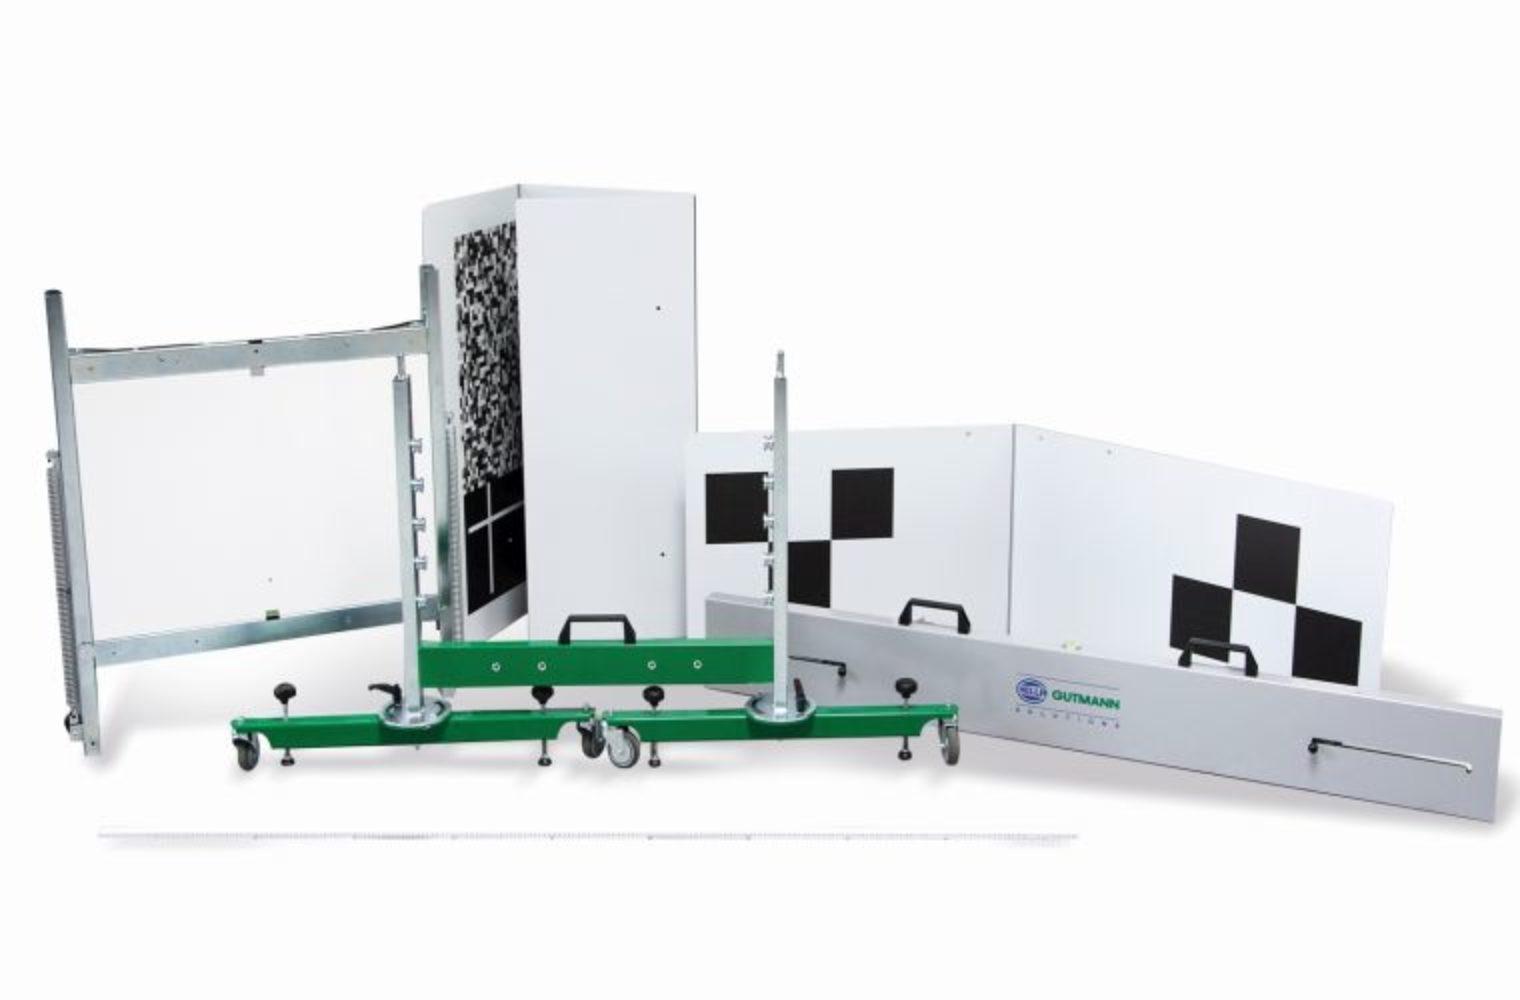 Hella Gutmann Solutions launches portable ADAS calibration